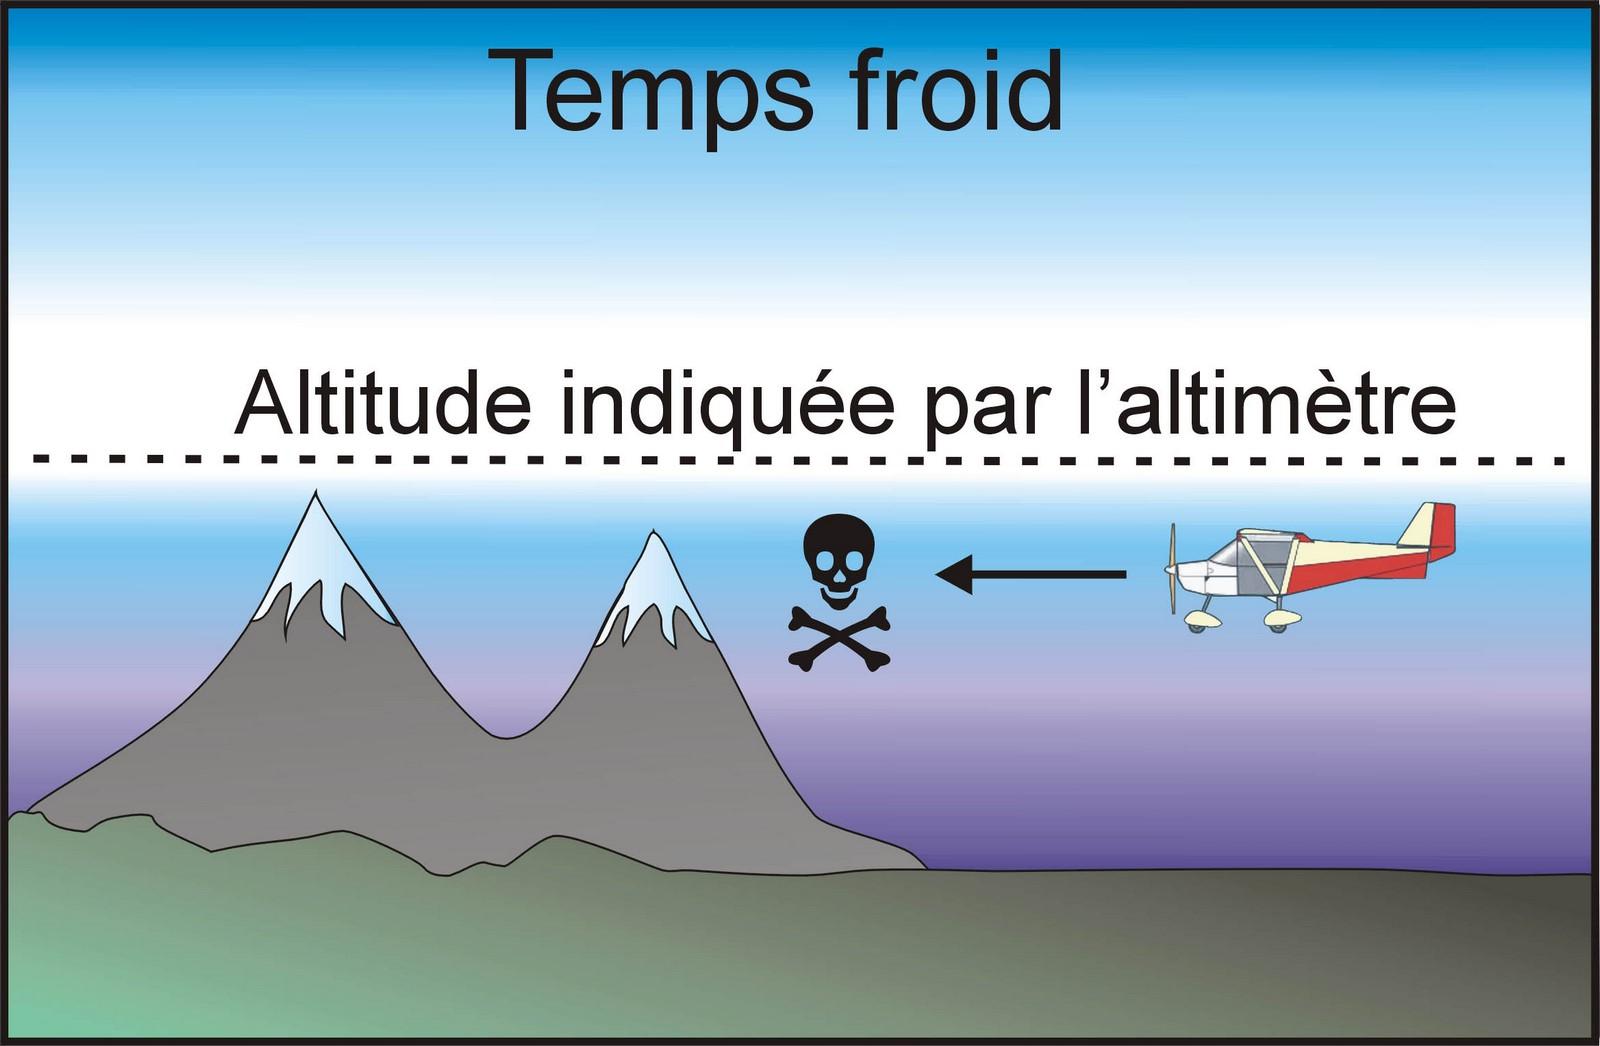 fig11tempsfroid.jpg